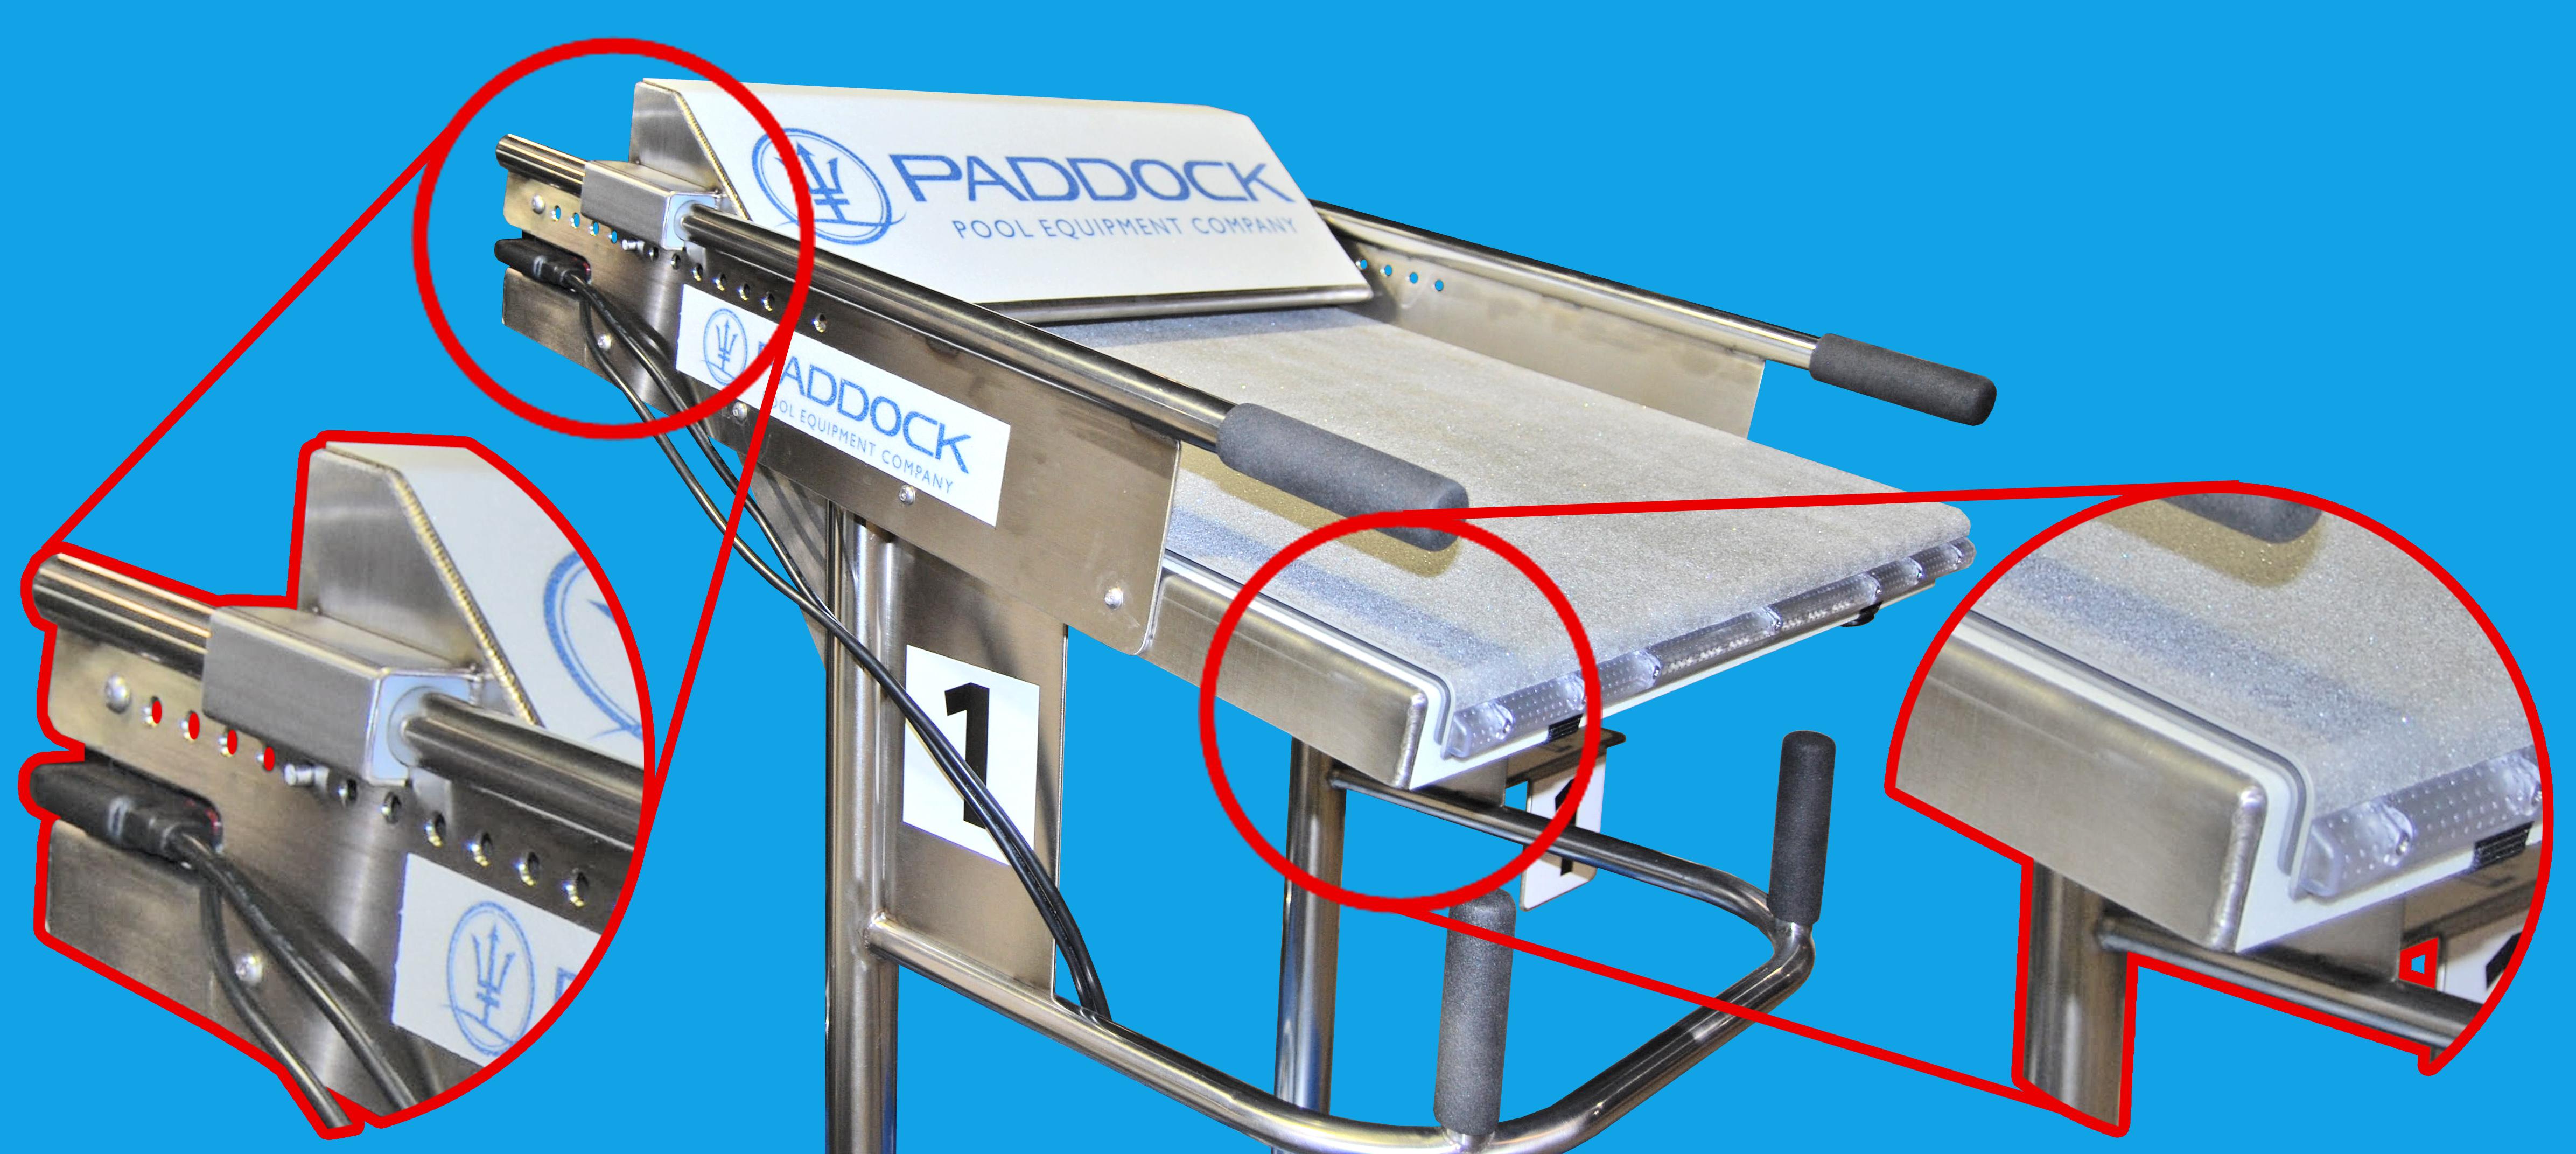 Fast Track Timer Clip Paddock Pool Equipment Company